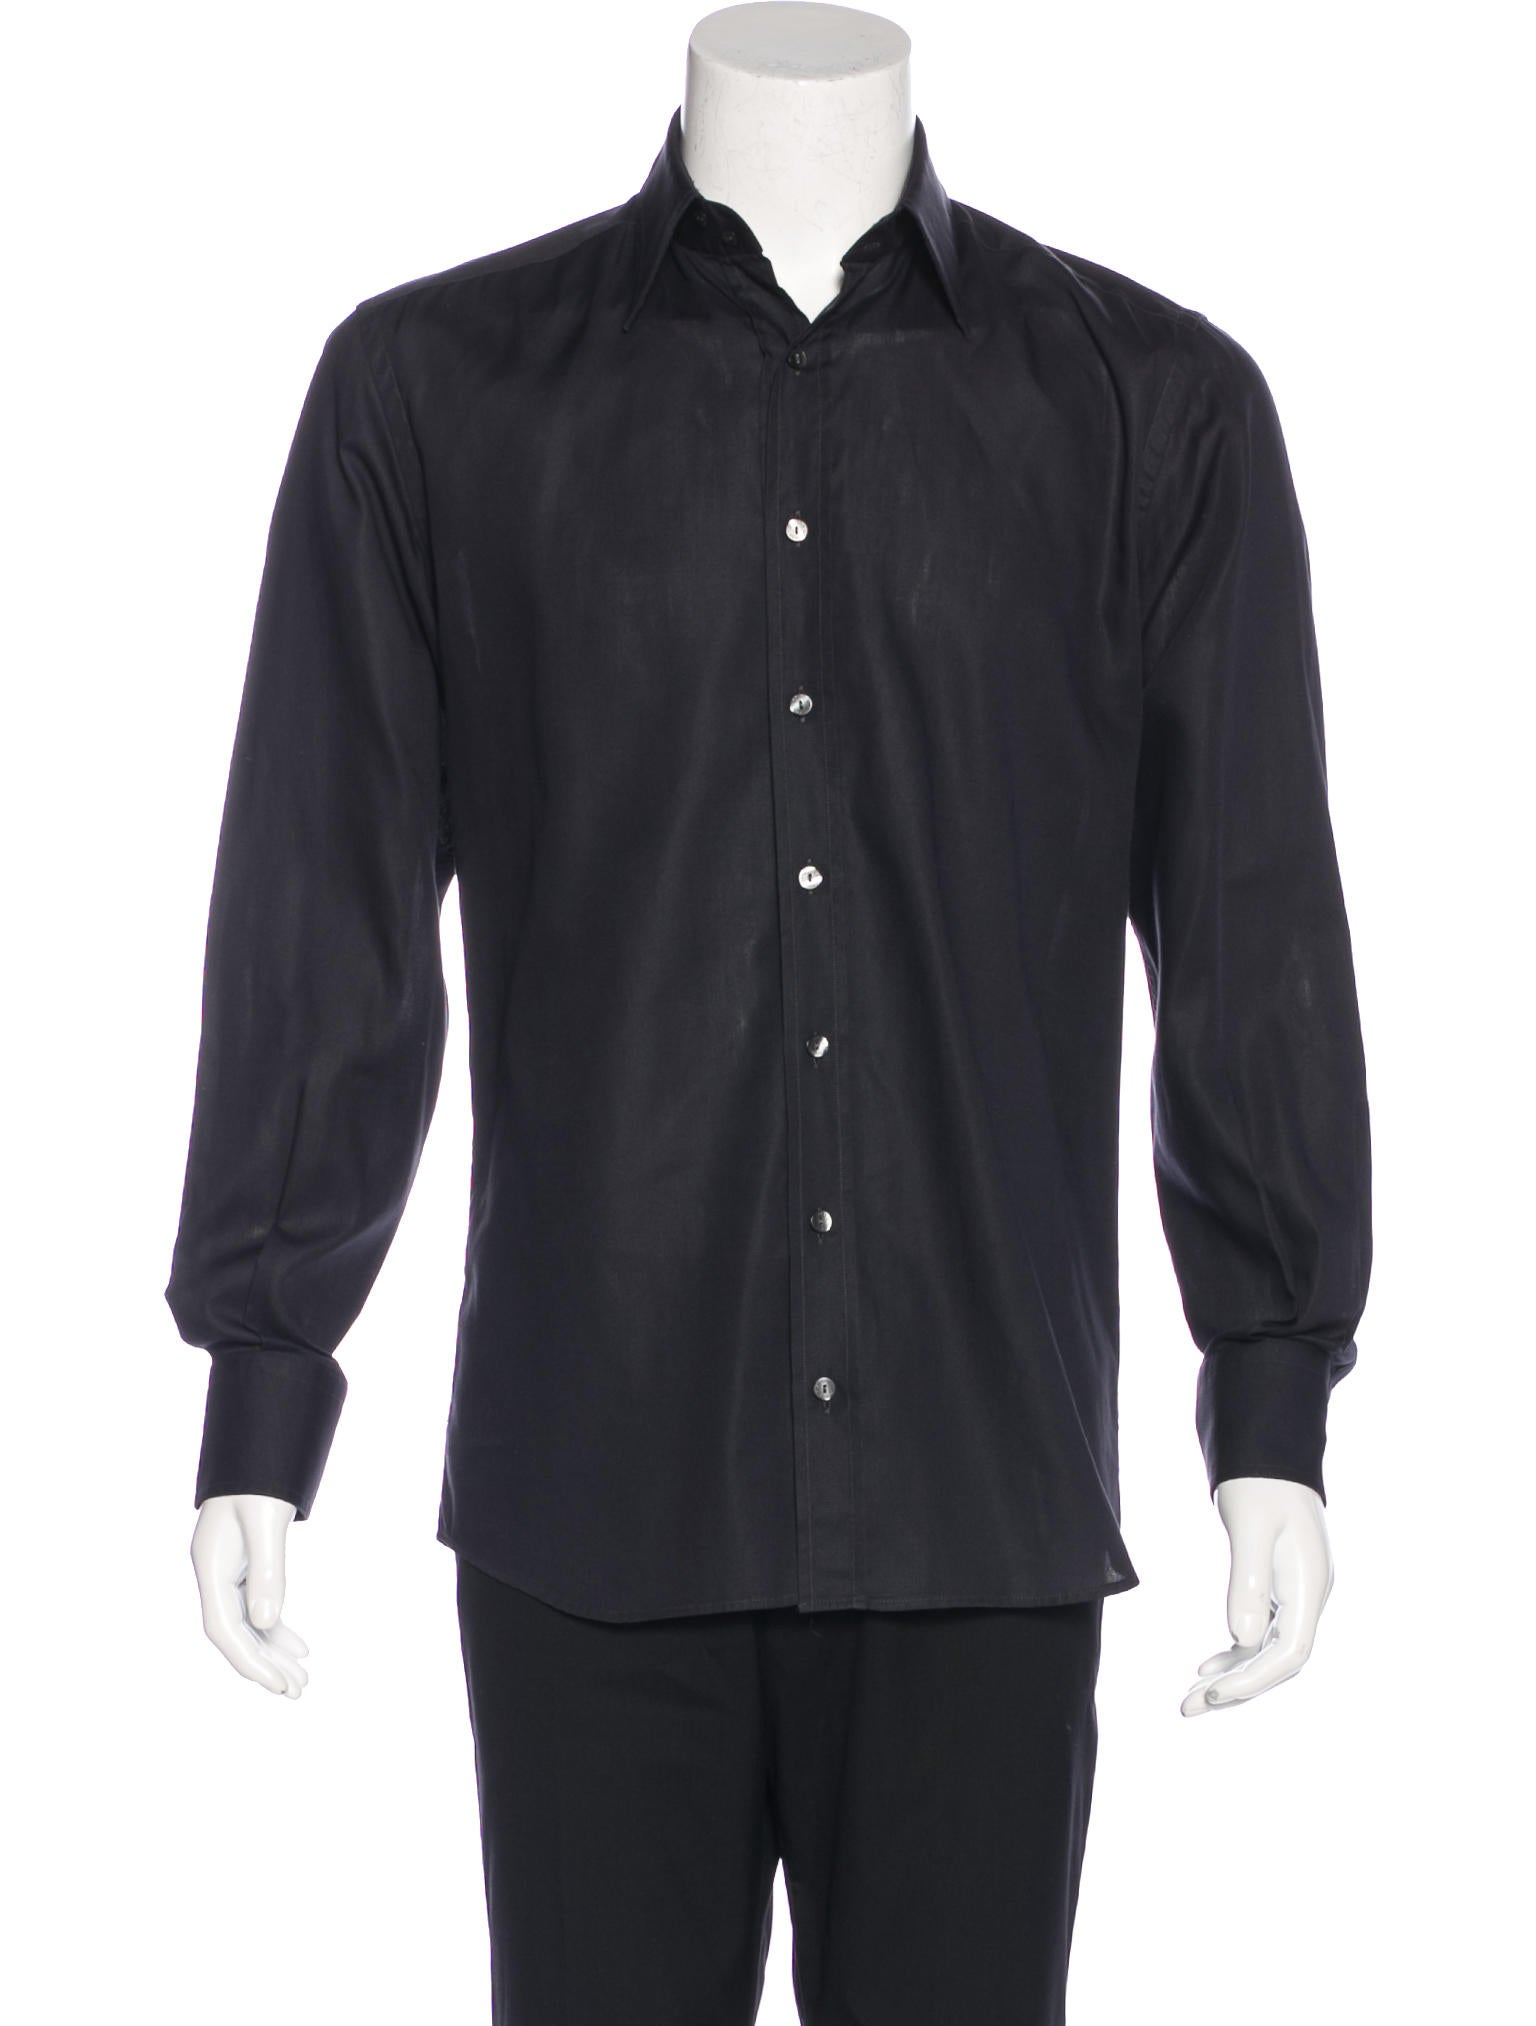 Dolce gabbana tailored dress shirt clothing dag84344 for Tailoring a dress shirt